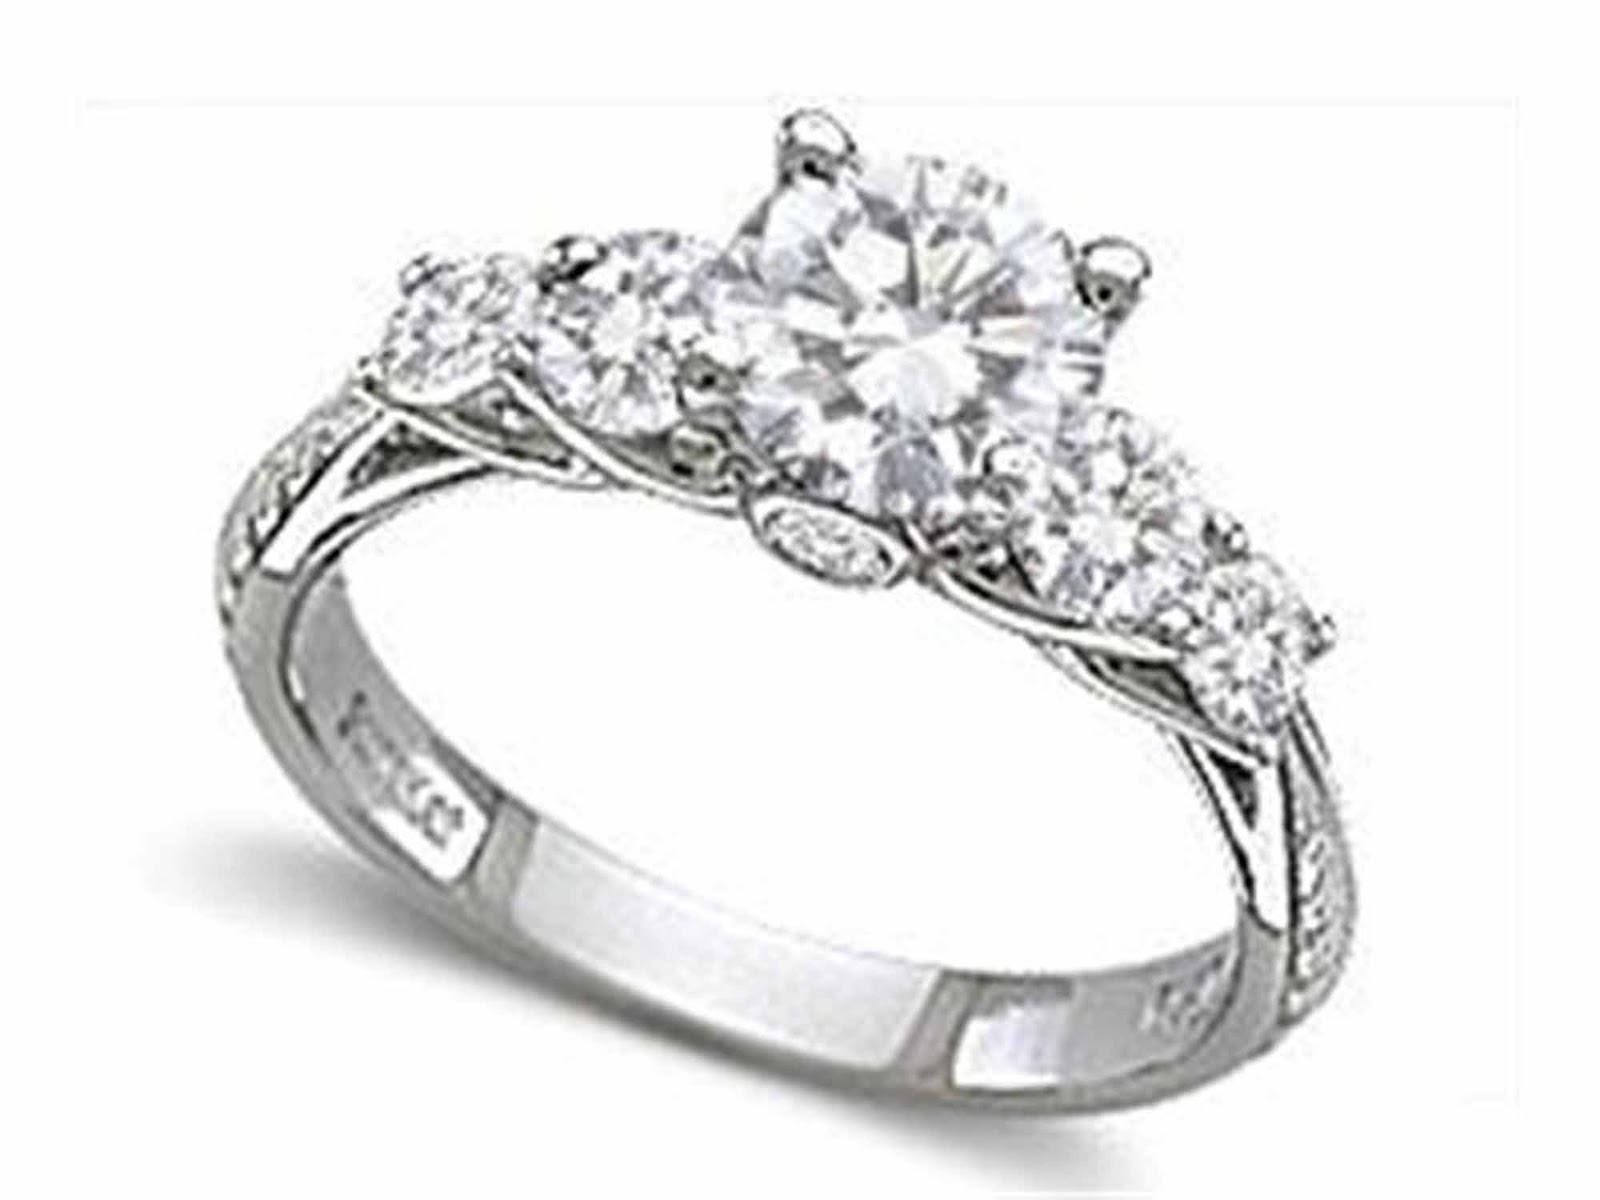 wedding rings inexpensive wedding rings expensive Wedding rings inexpensive Picking The Inexpensive Promise Rings For Her